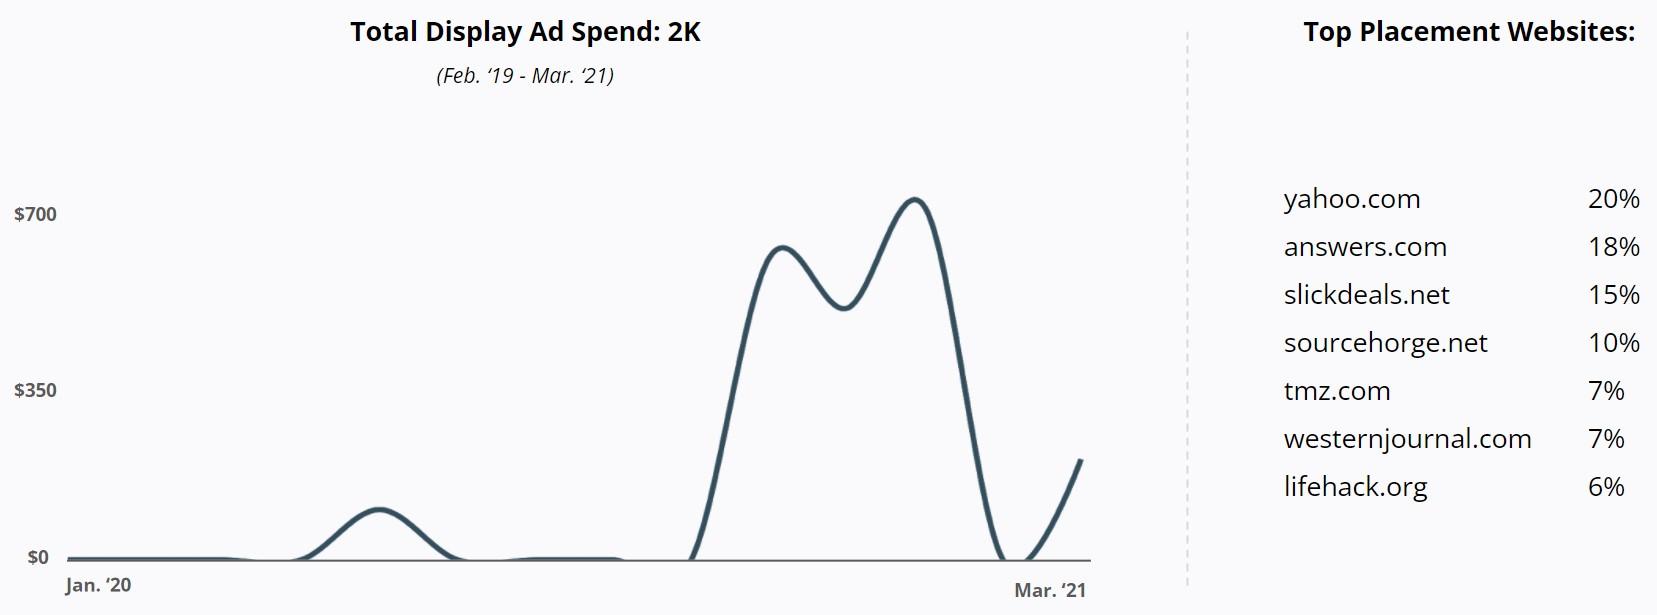 RobustWealth - Total Display Ad Spend